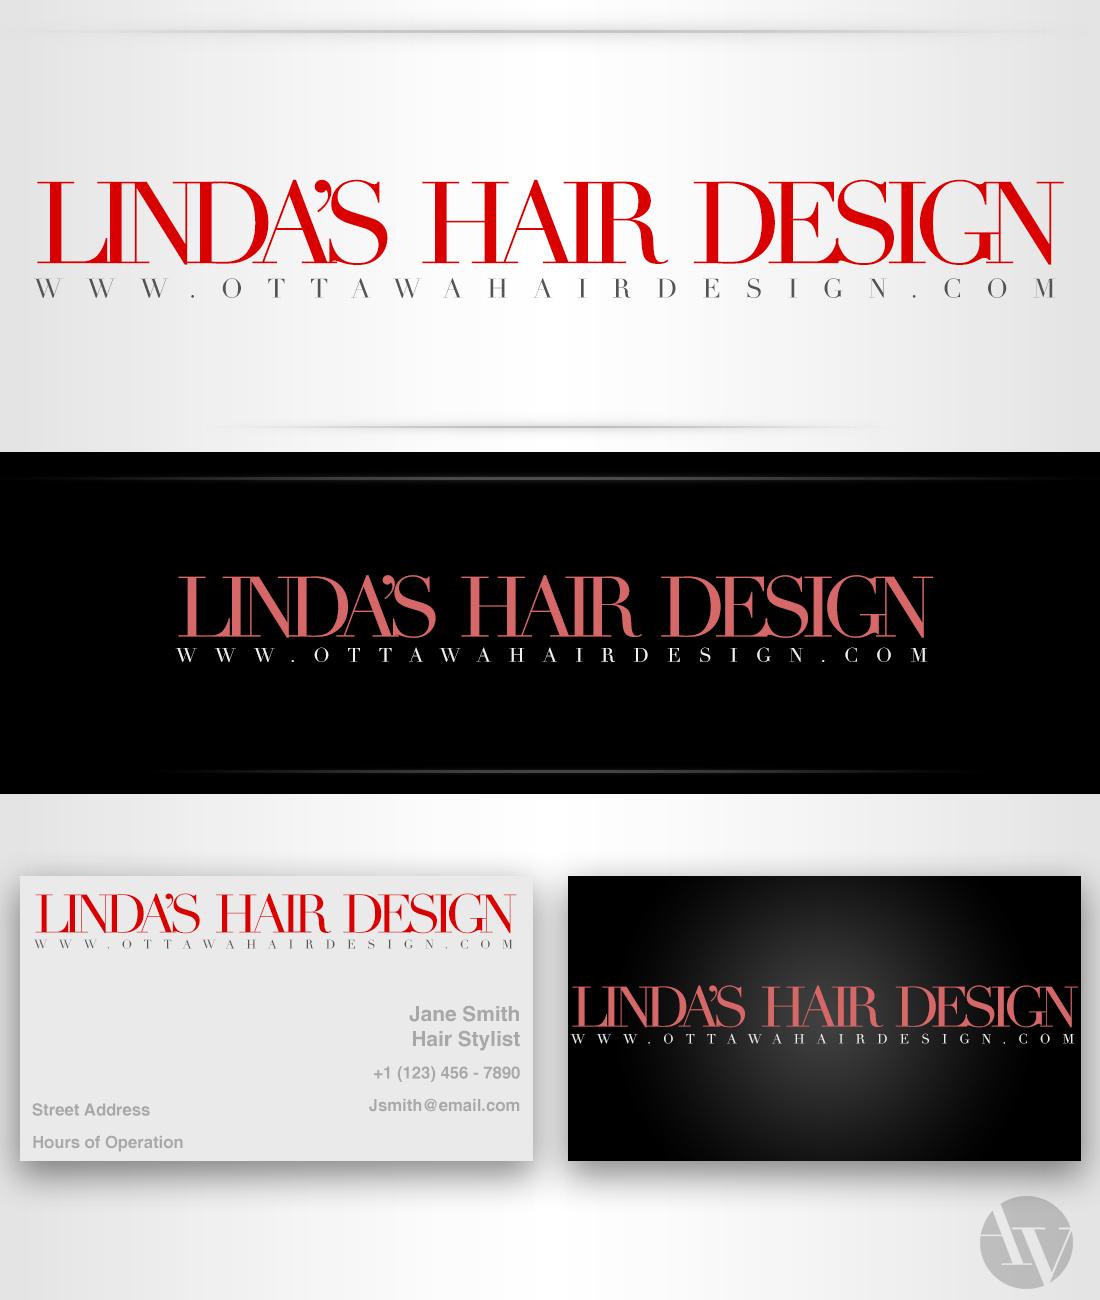 Linda's Hair Design Logo